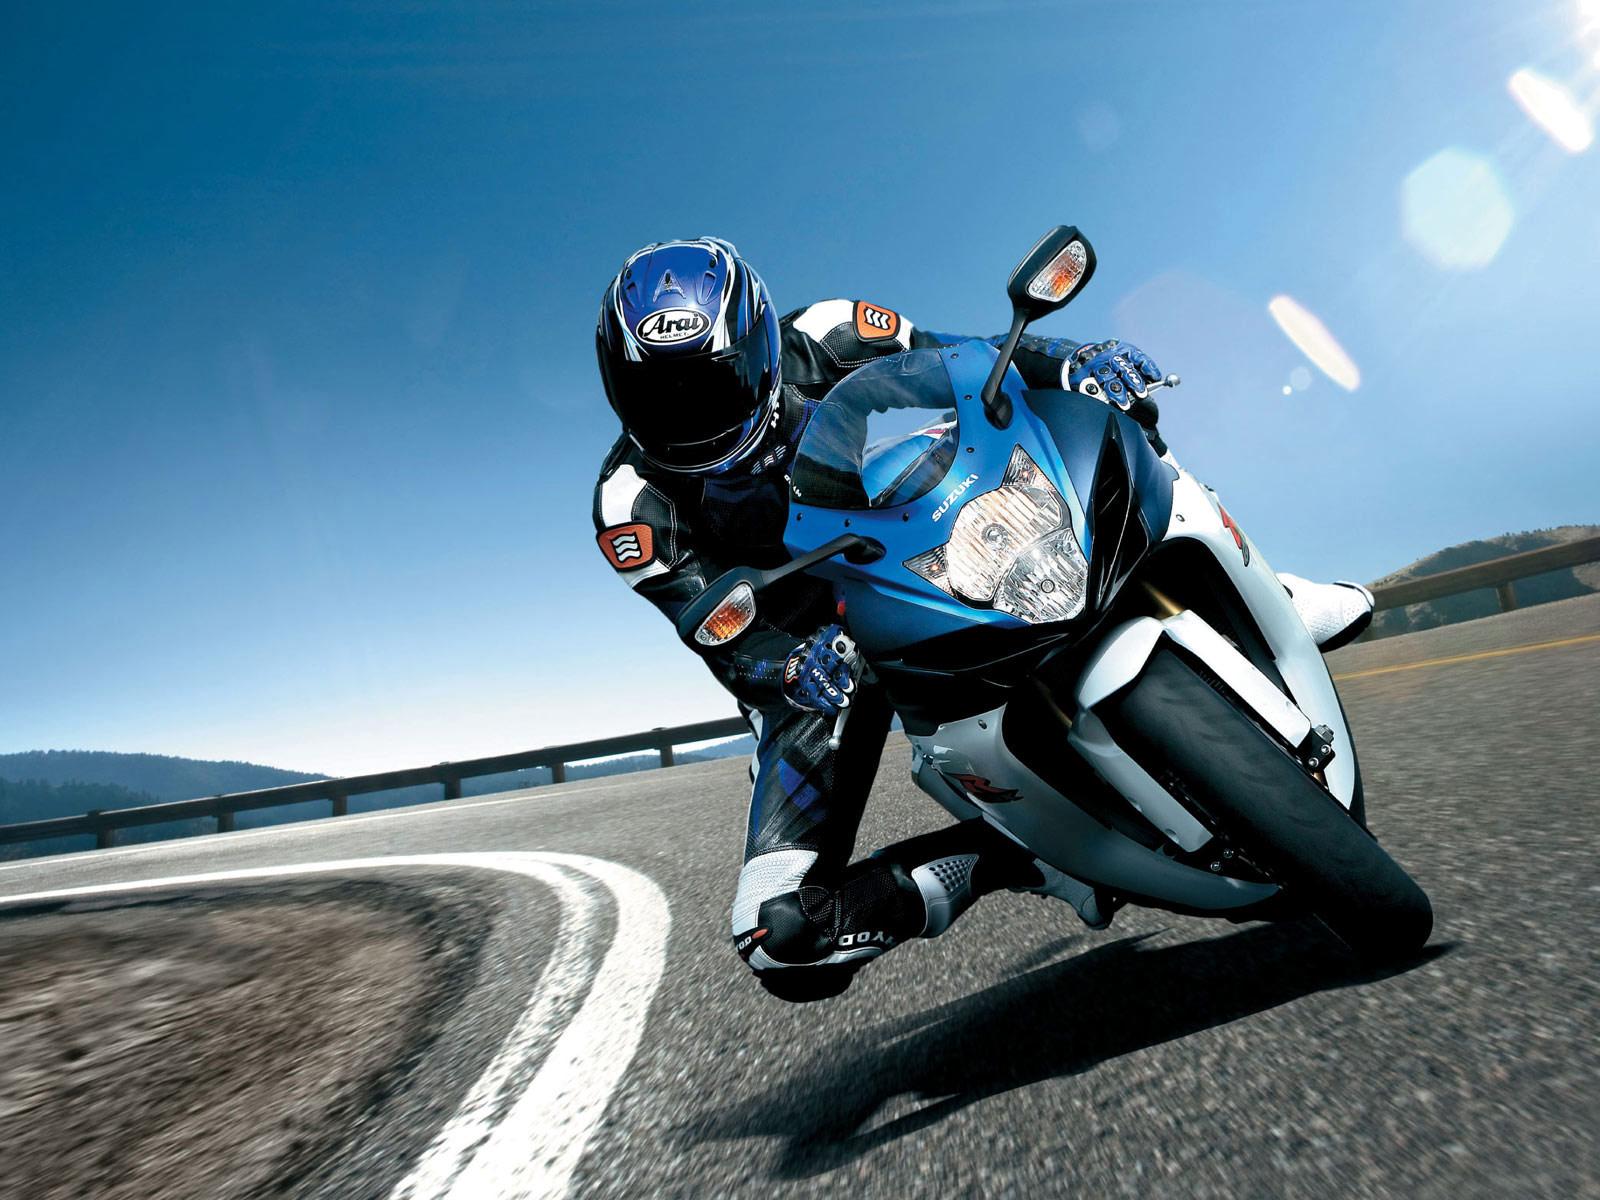 http://1.bp.blogspot.com/-XMroEr9i5os/TuVSbO-wLOI/AAAAAAAAFPI/BSPDvvo4oJI/s1600/2011_Suzuki_GSX-R_600_motorcycle-desktop-wallpaper_01.jpg